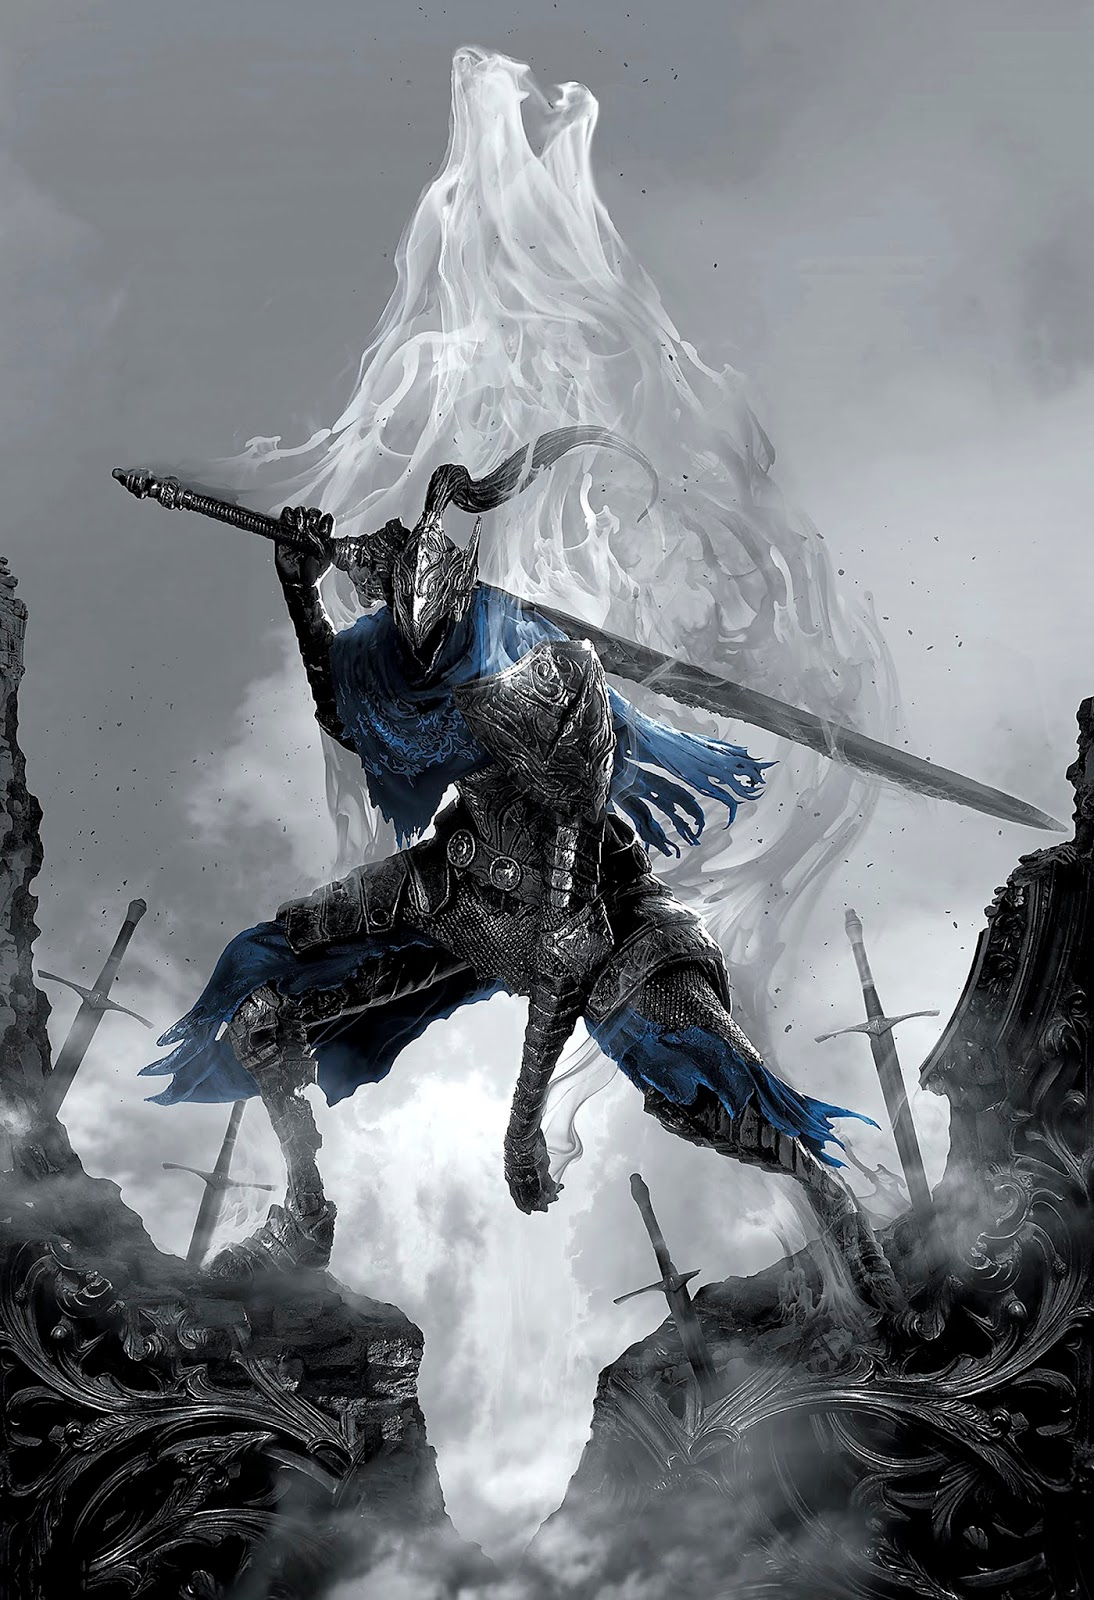 The Geeky Nerfherder: #CoolArt: 'Dark Souls: Artorias the